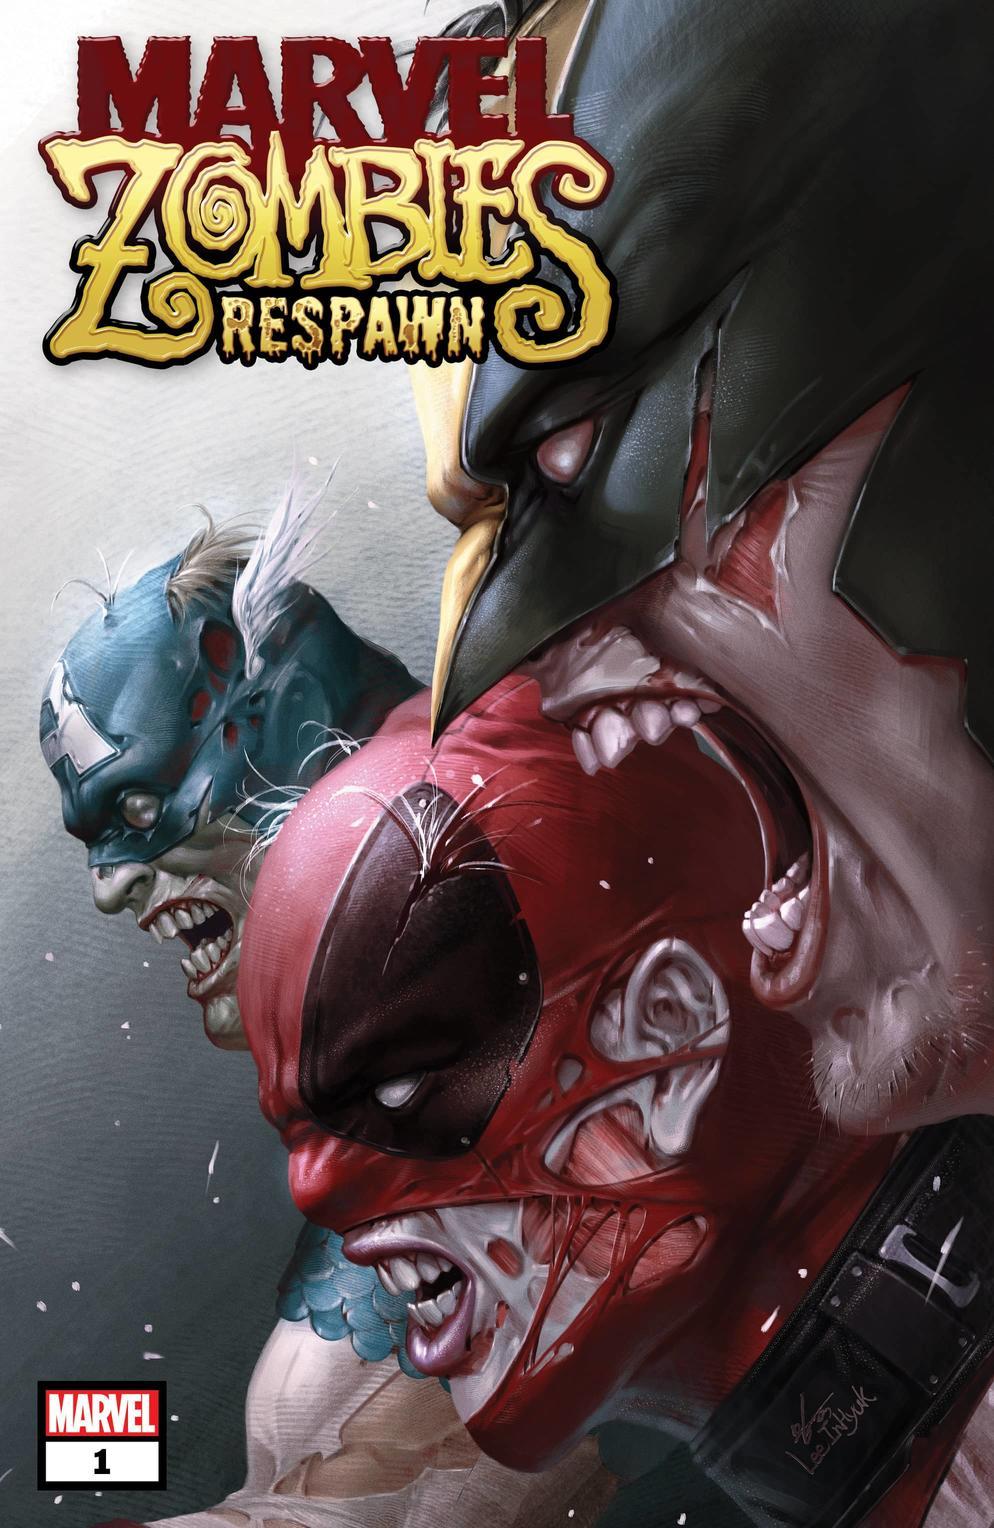 Marvel Zombies: Respawn #1, copertina di InHyuk Lee